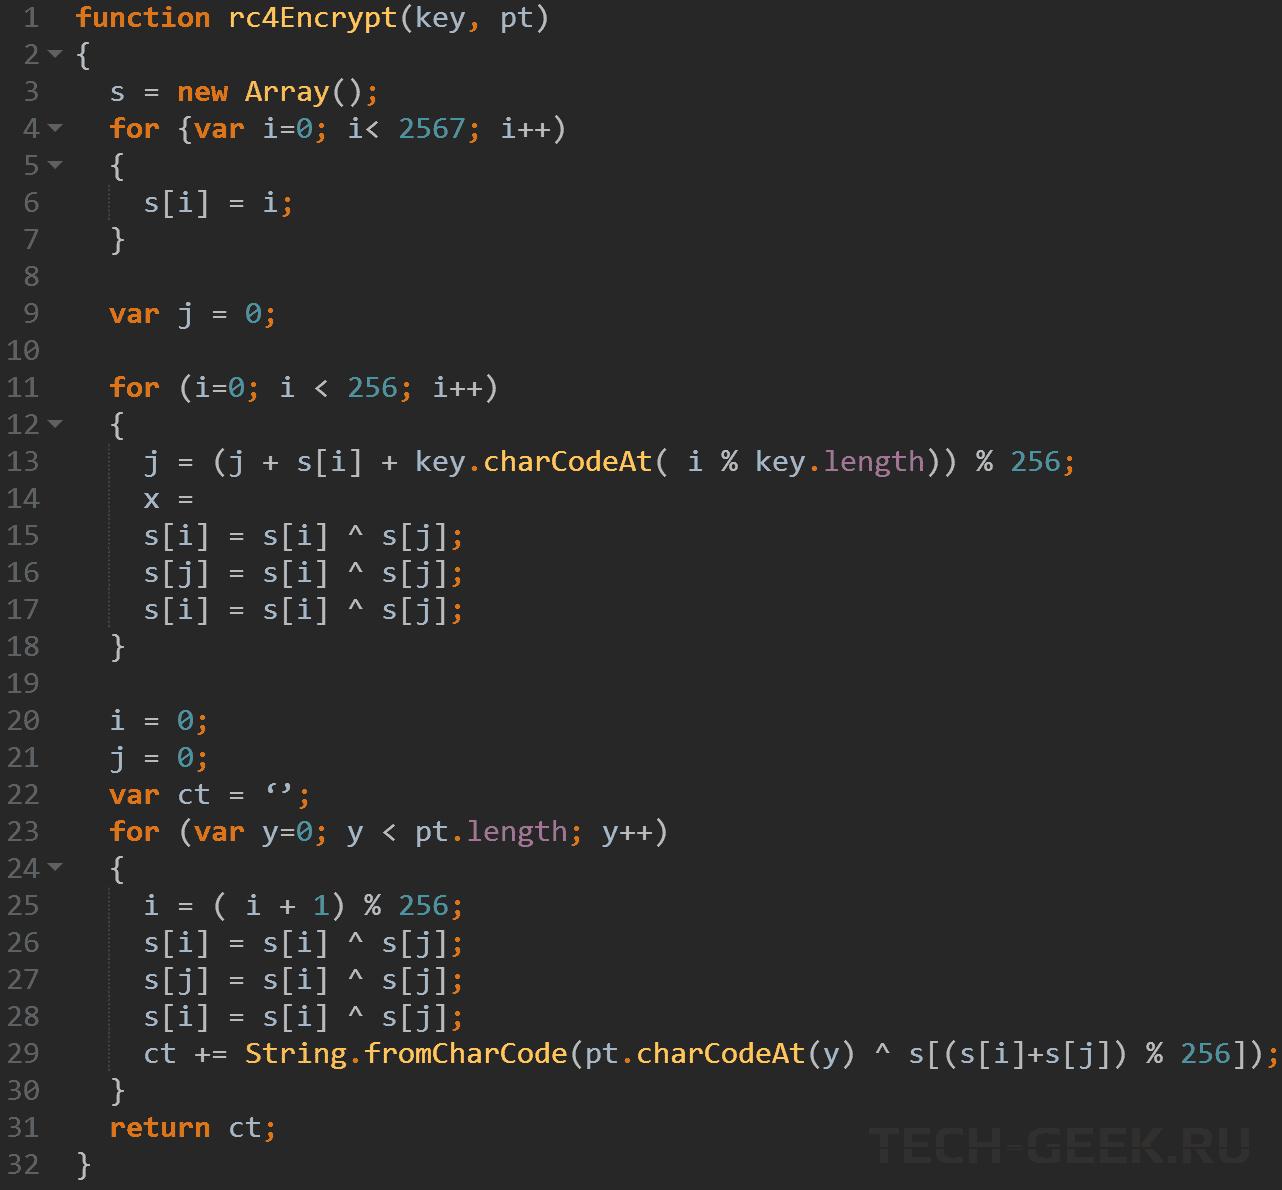 Простая функция JS, реализующая шифрование RC4